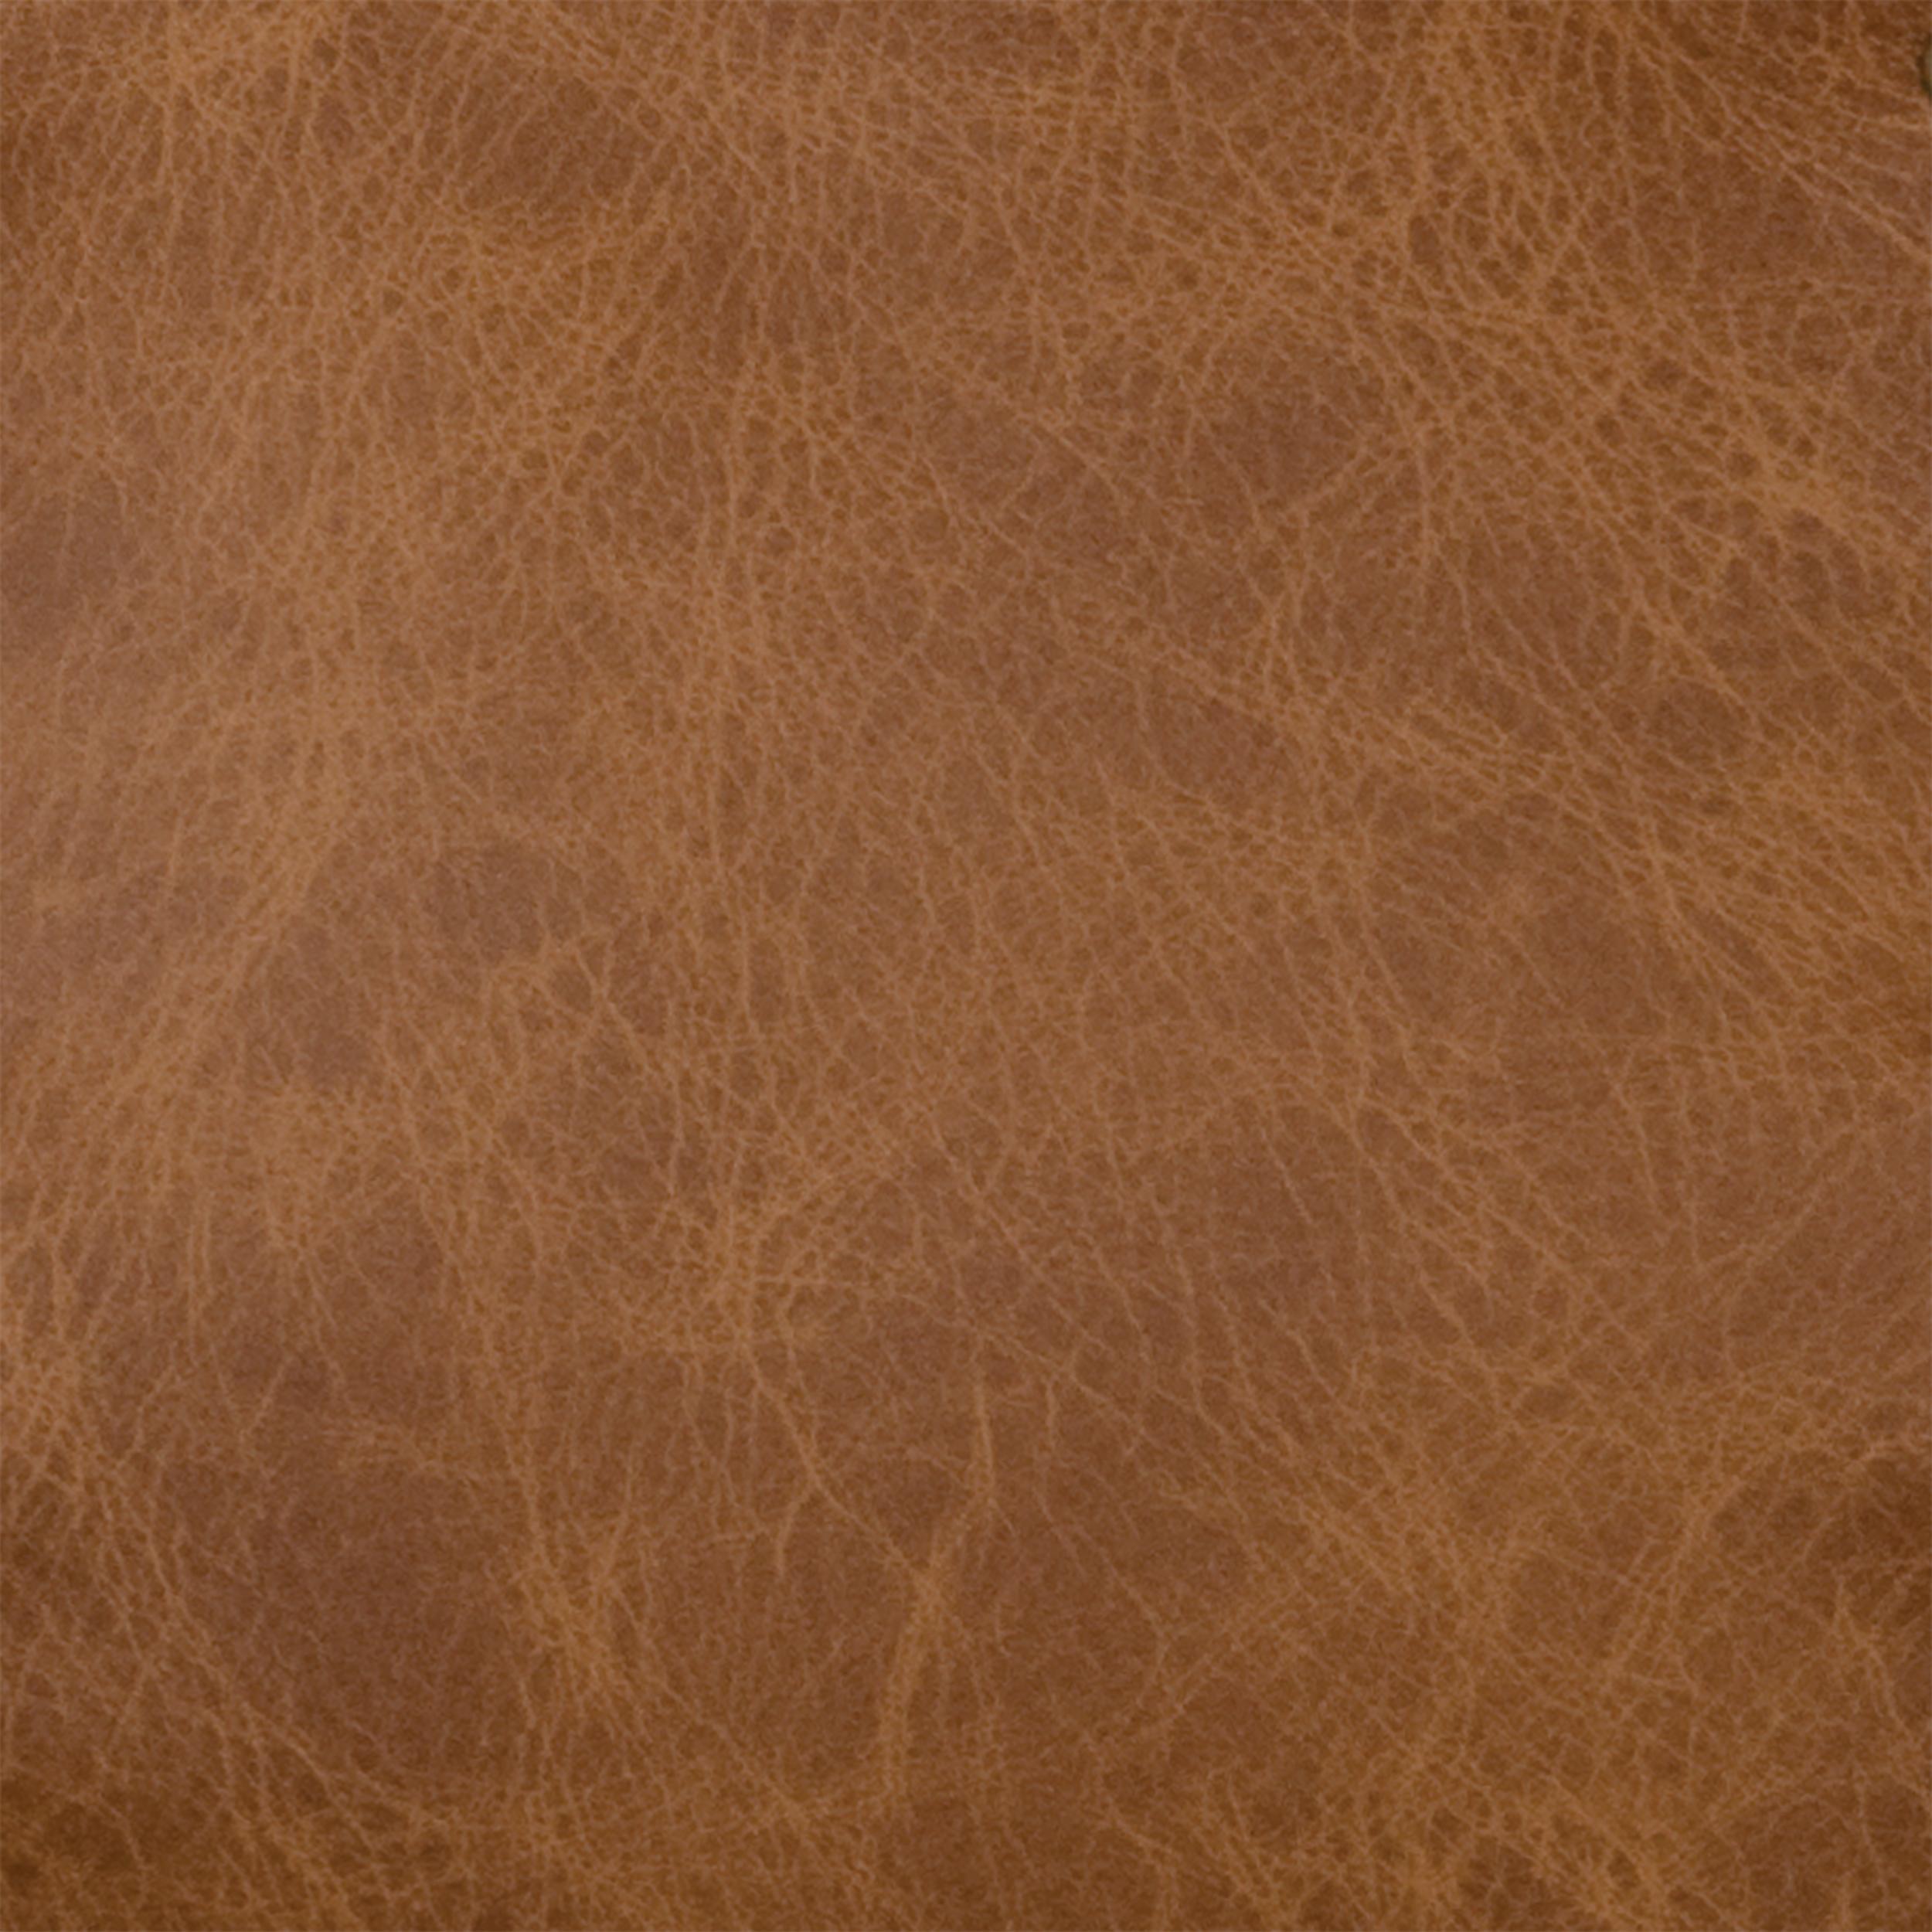 Whiskey Leather